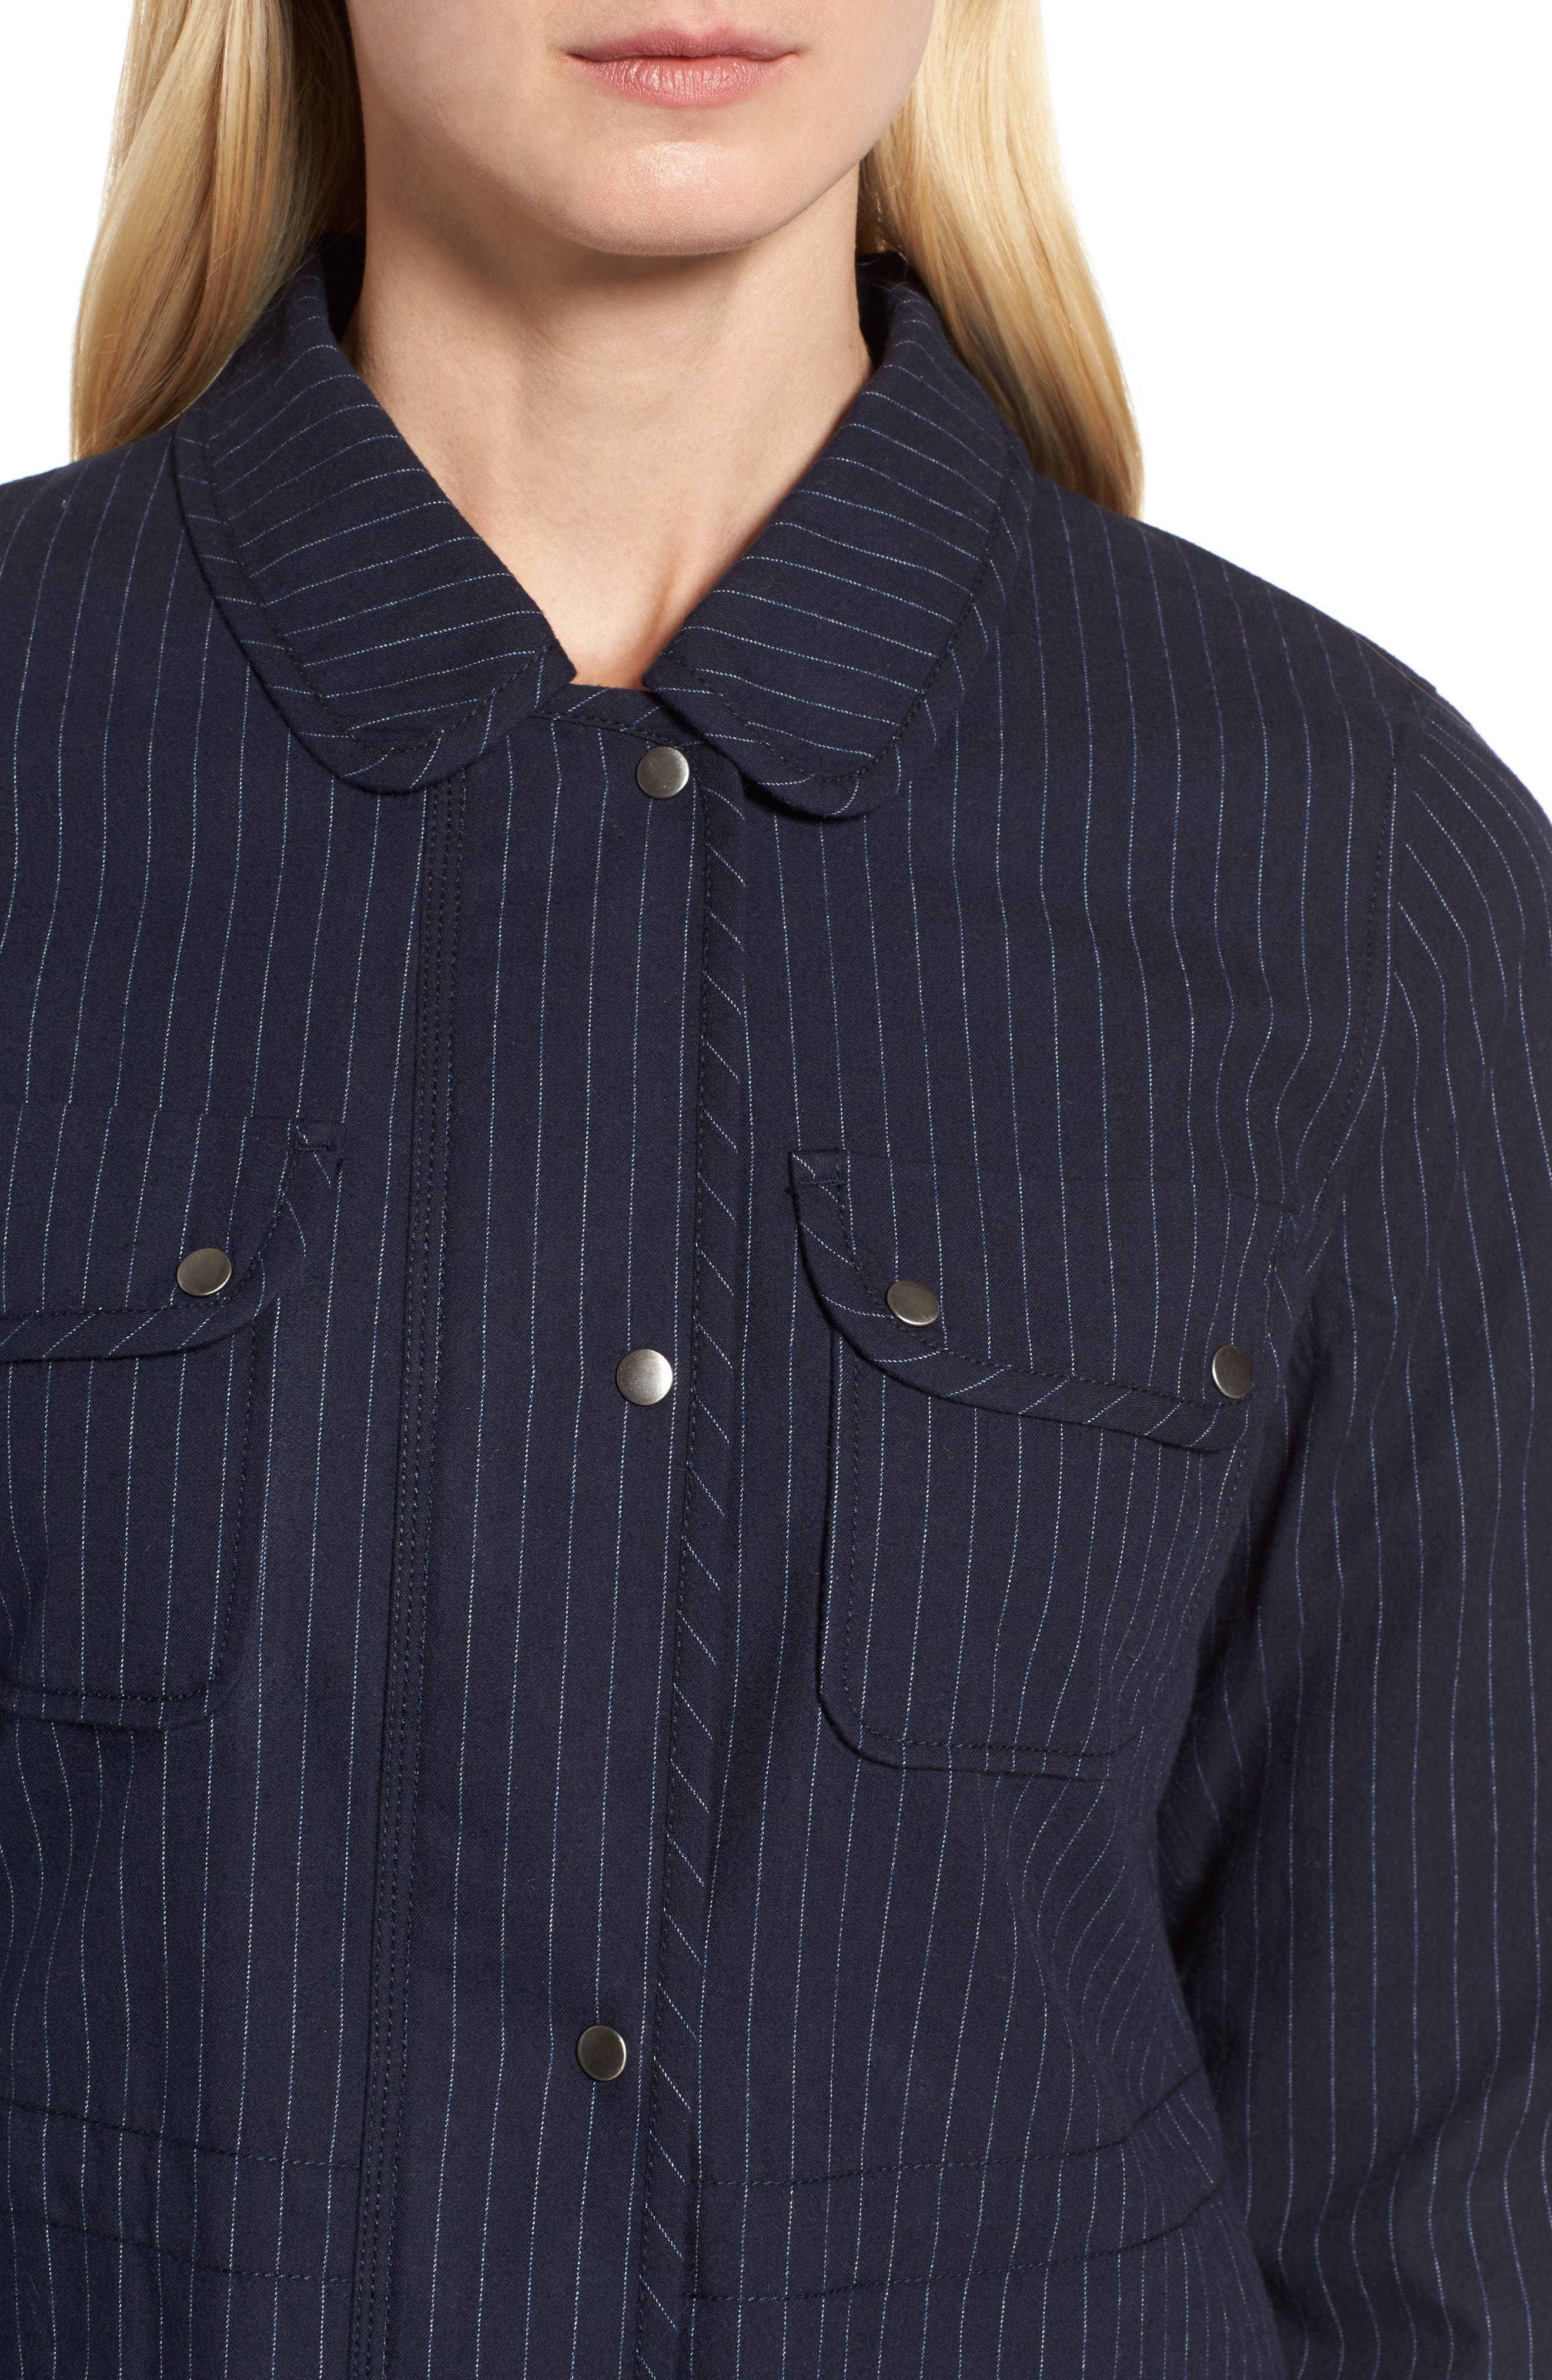 Pinstripe Utility Jacket,                             Alternate thumbnail 4, color,                             410